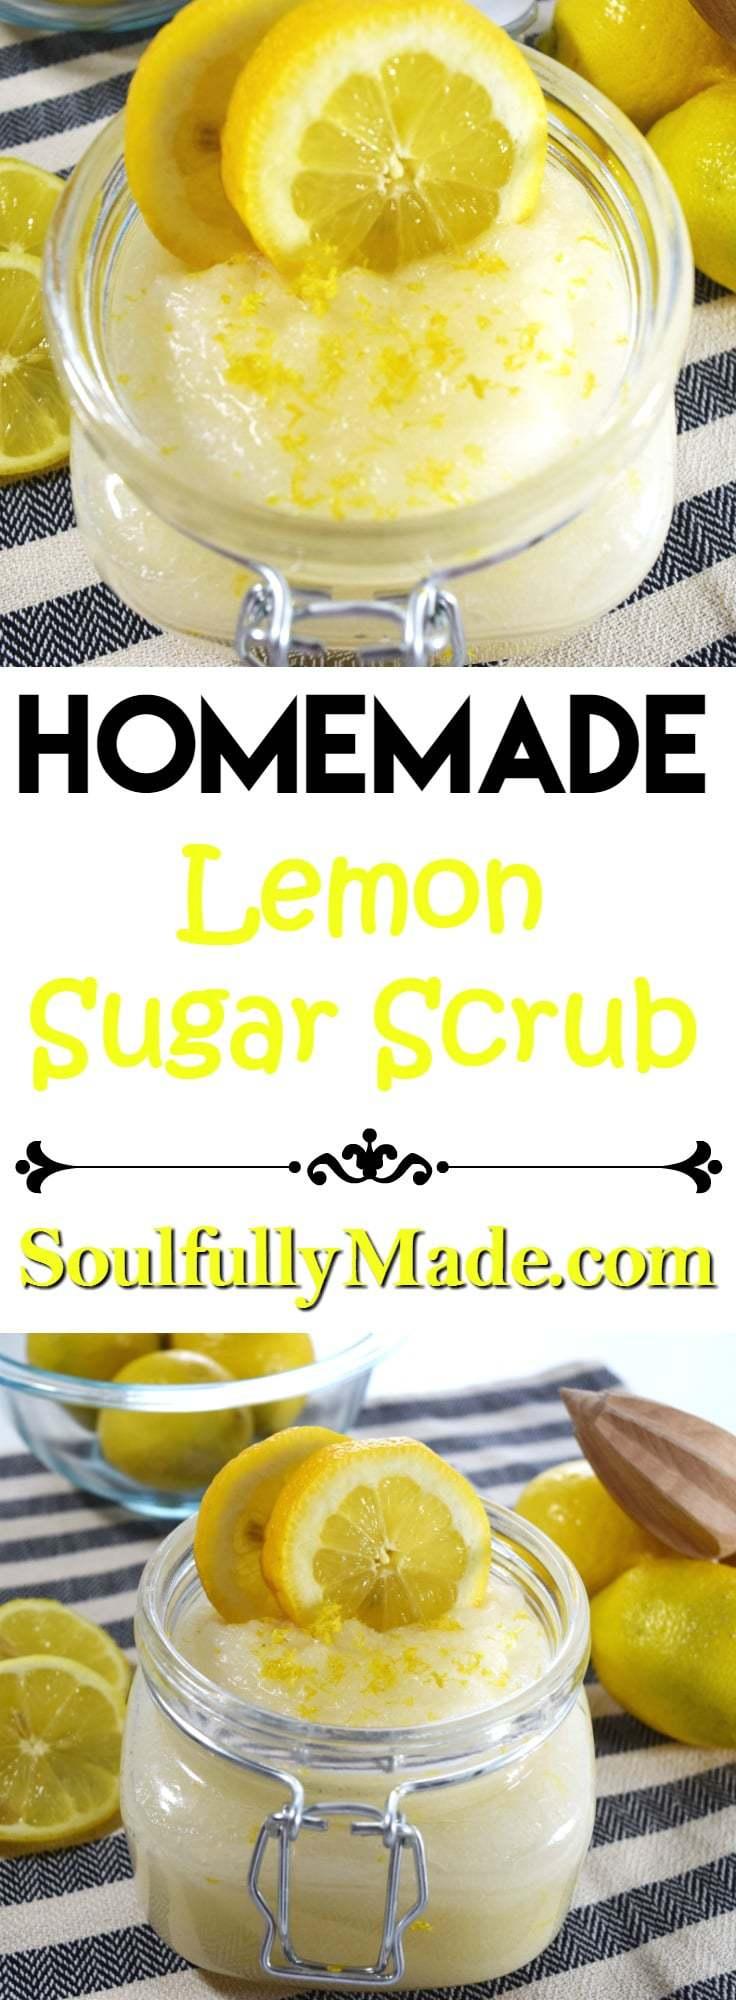 Homemade Sugar Scrub Pin